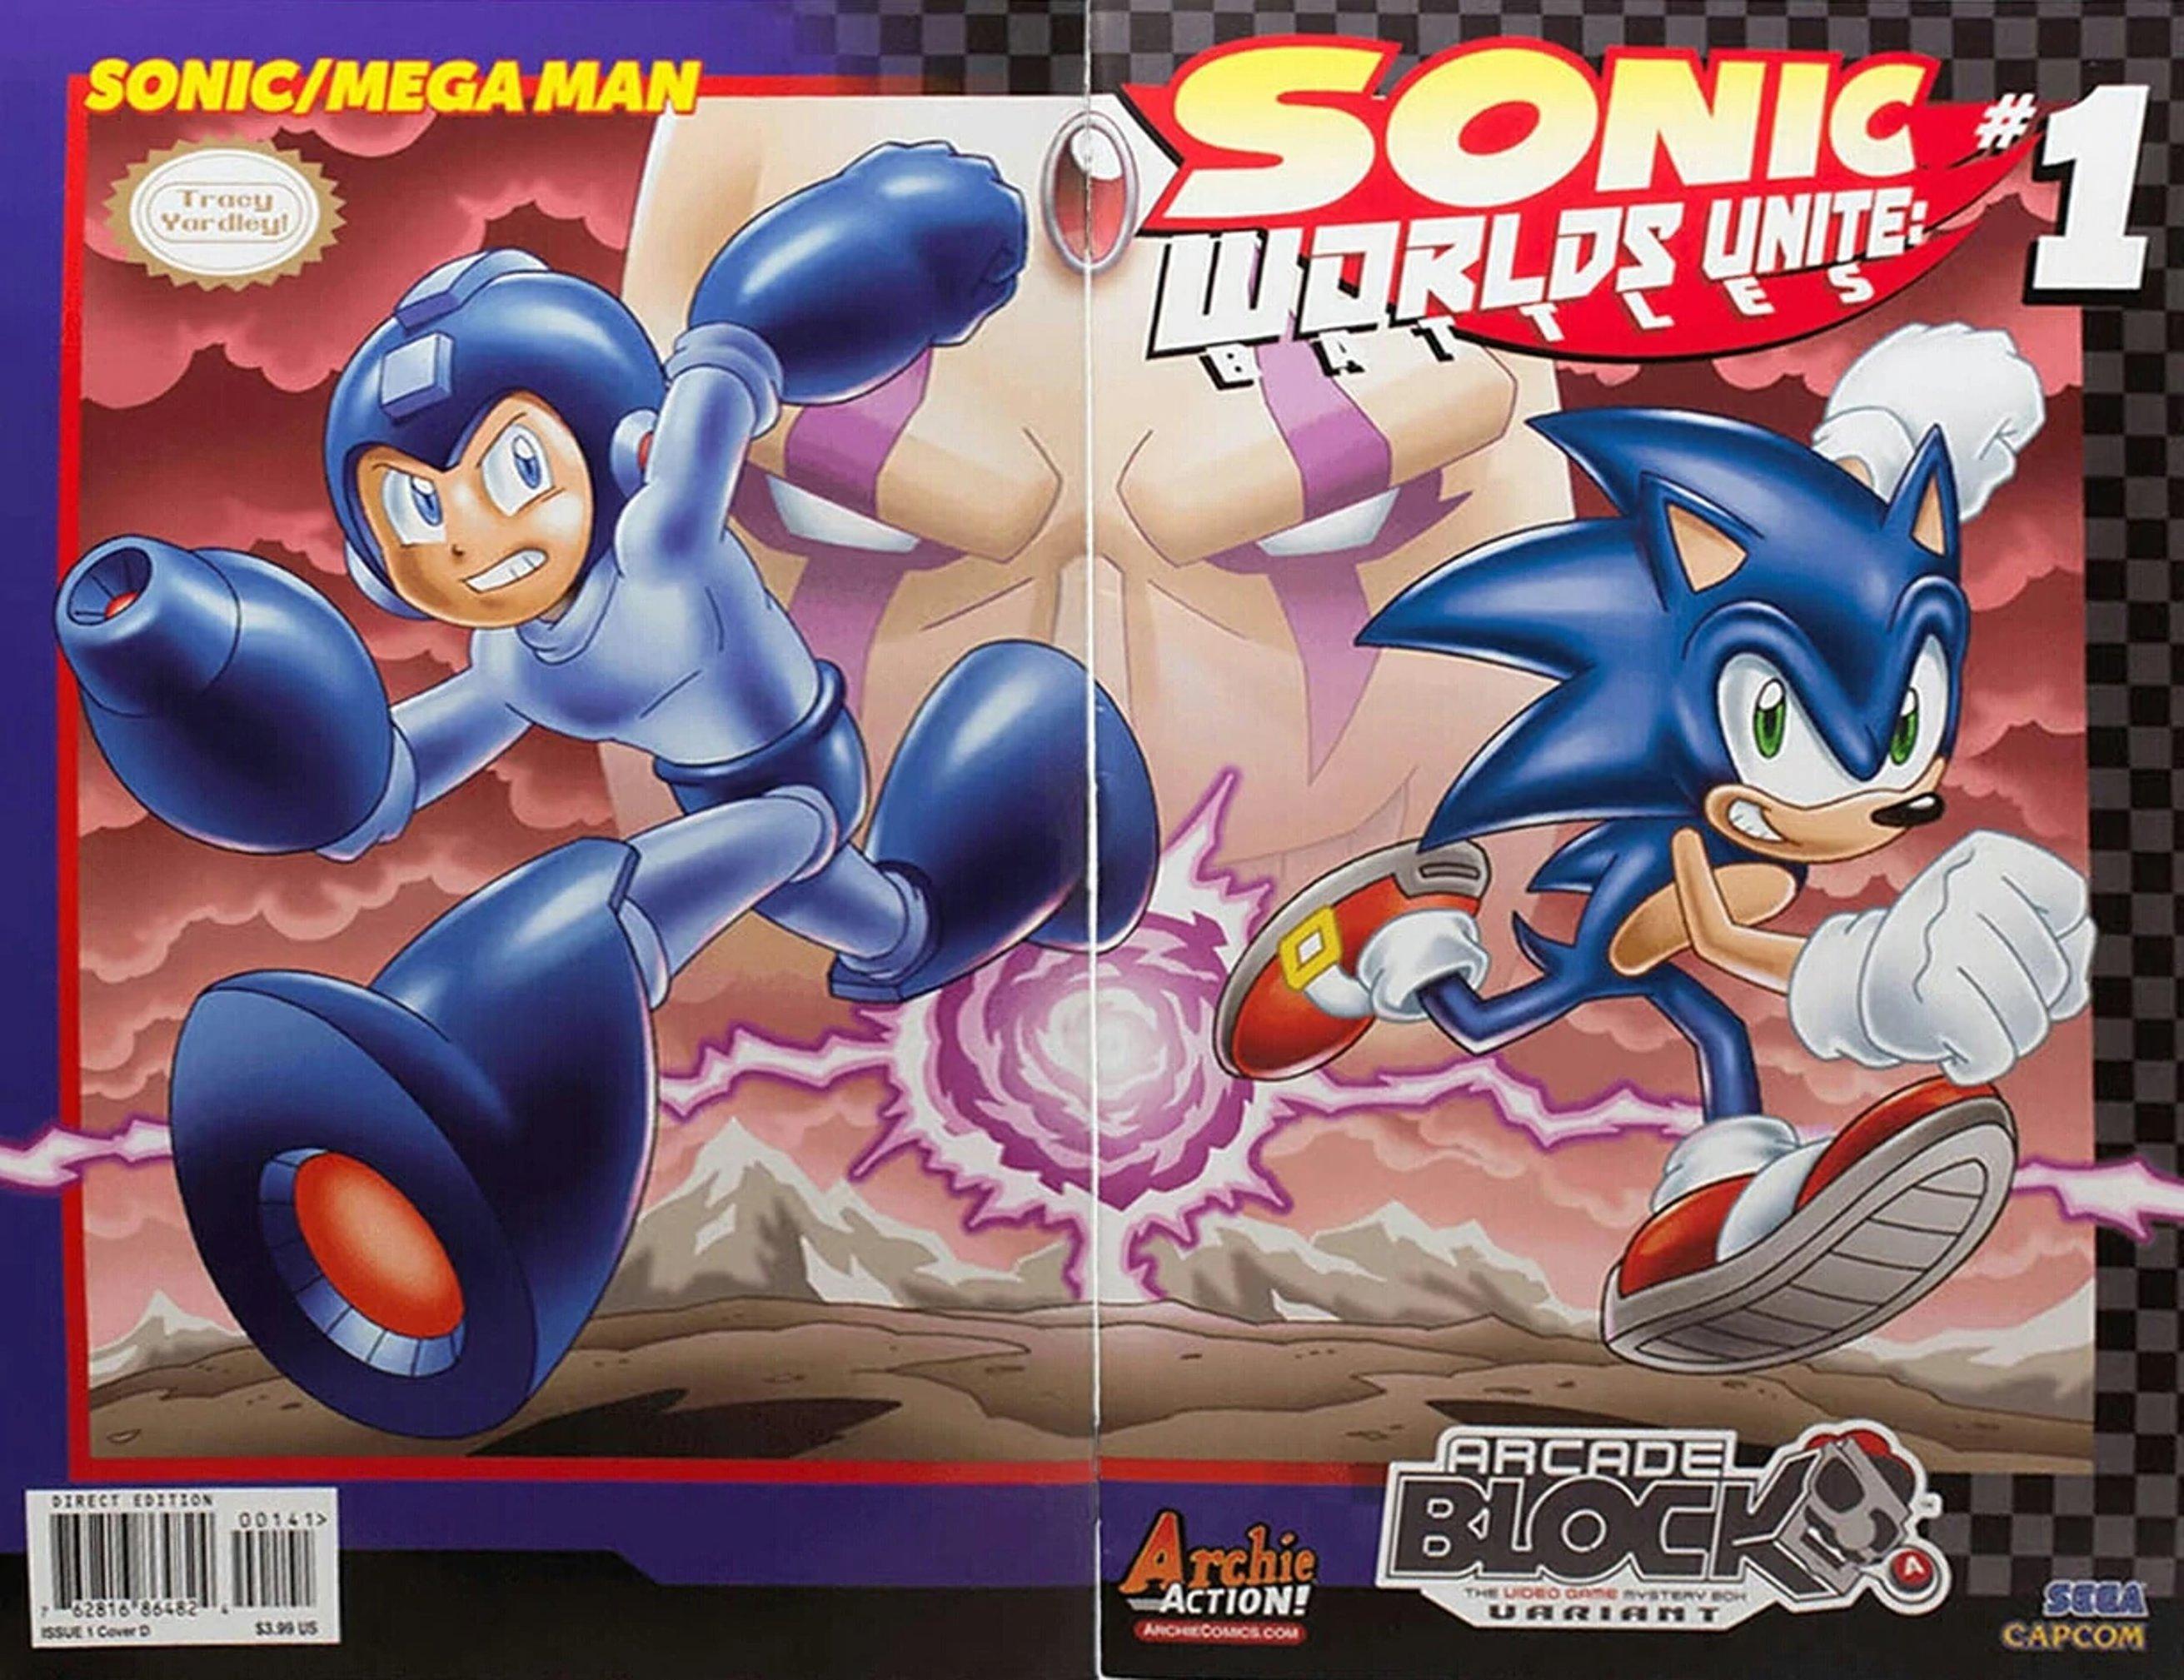 Archie Sonic the Hedgehog Worlds Unite Battles